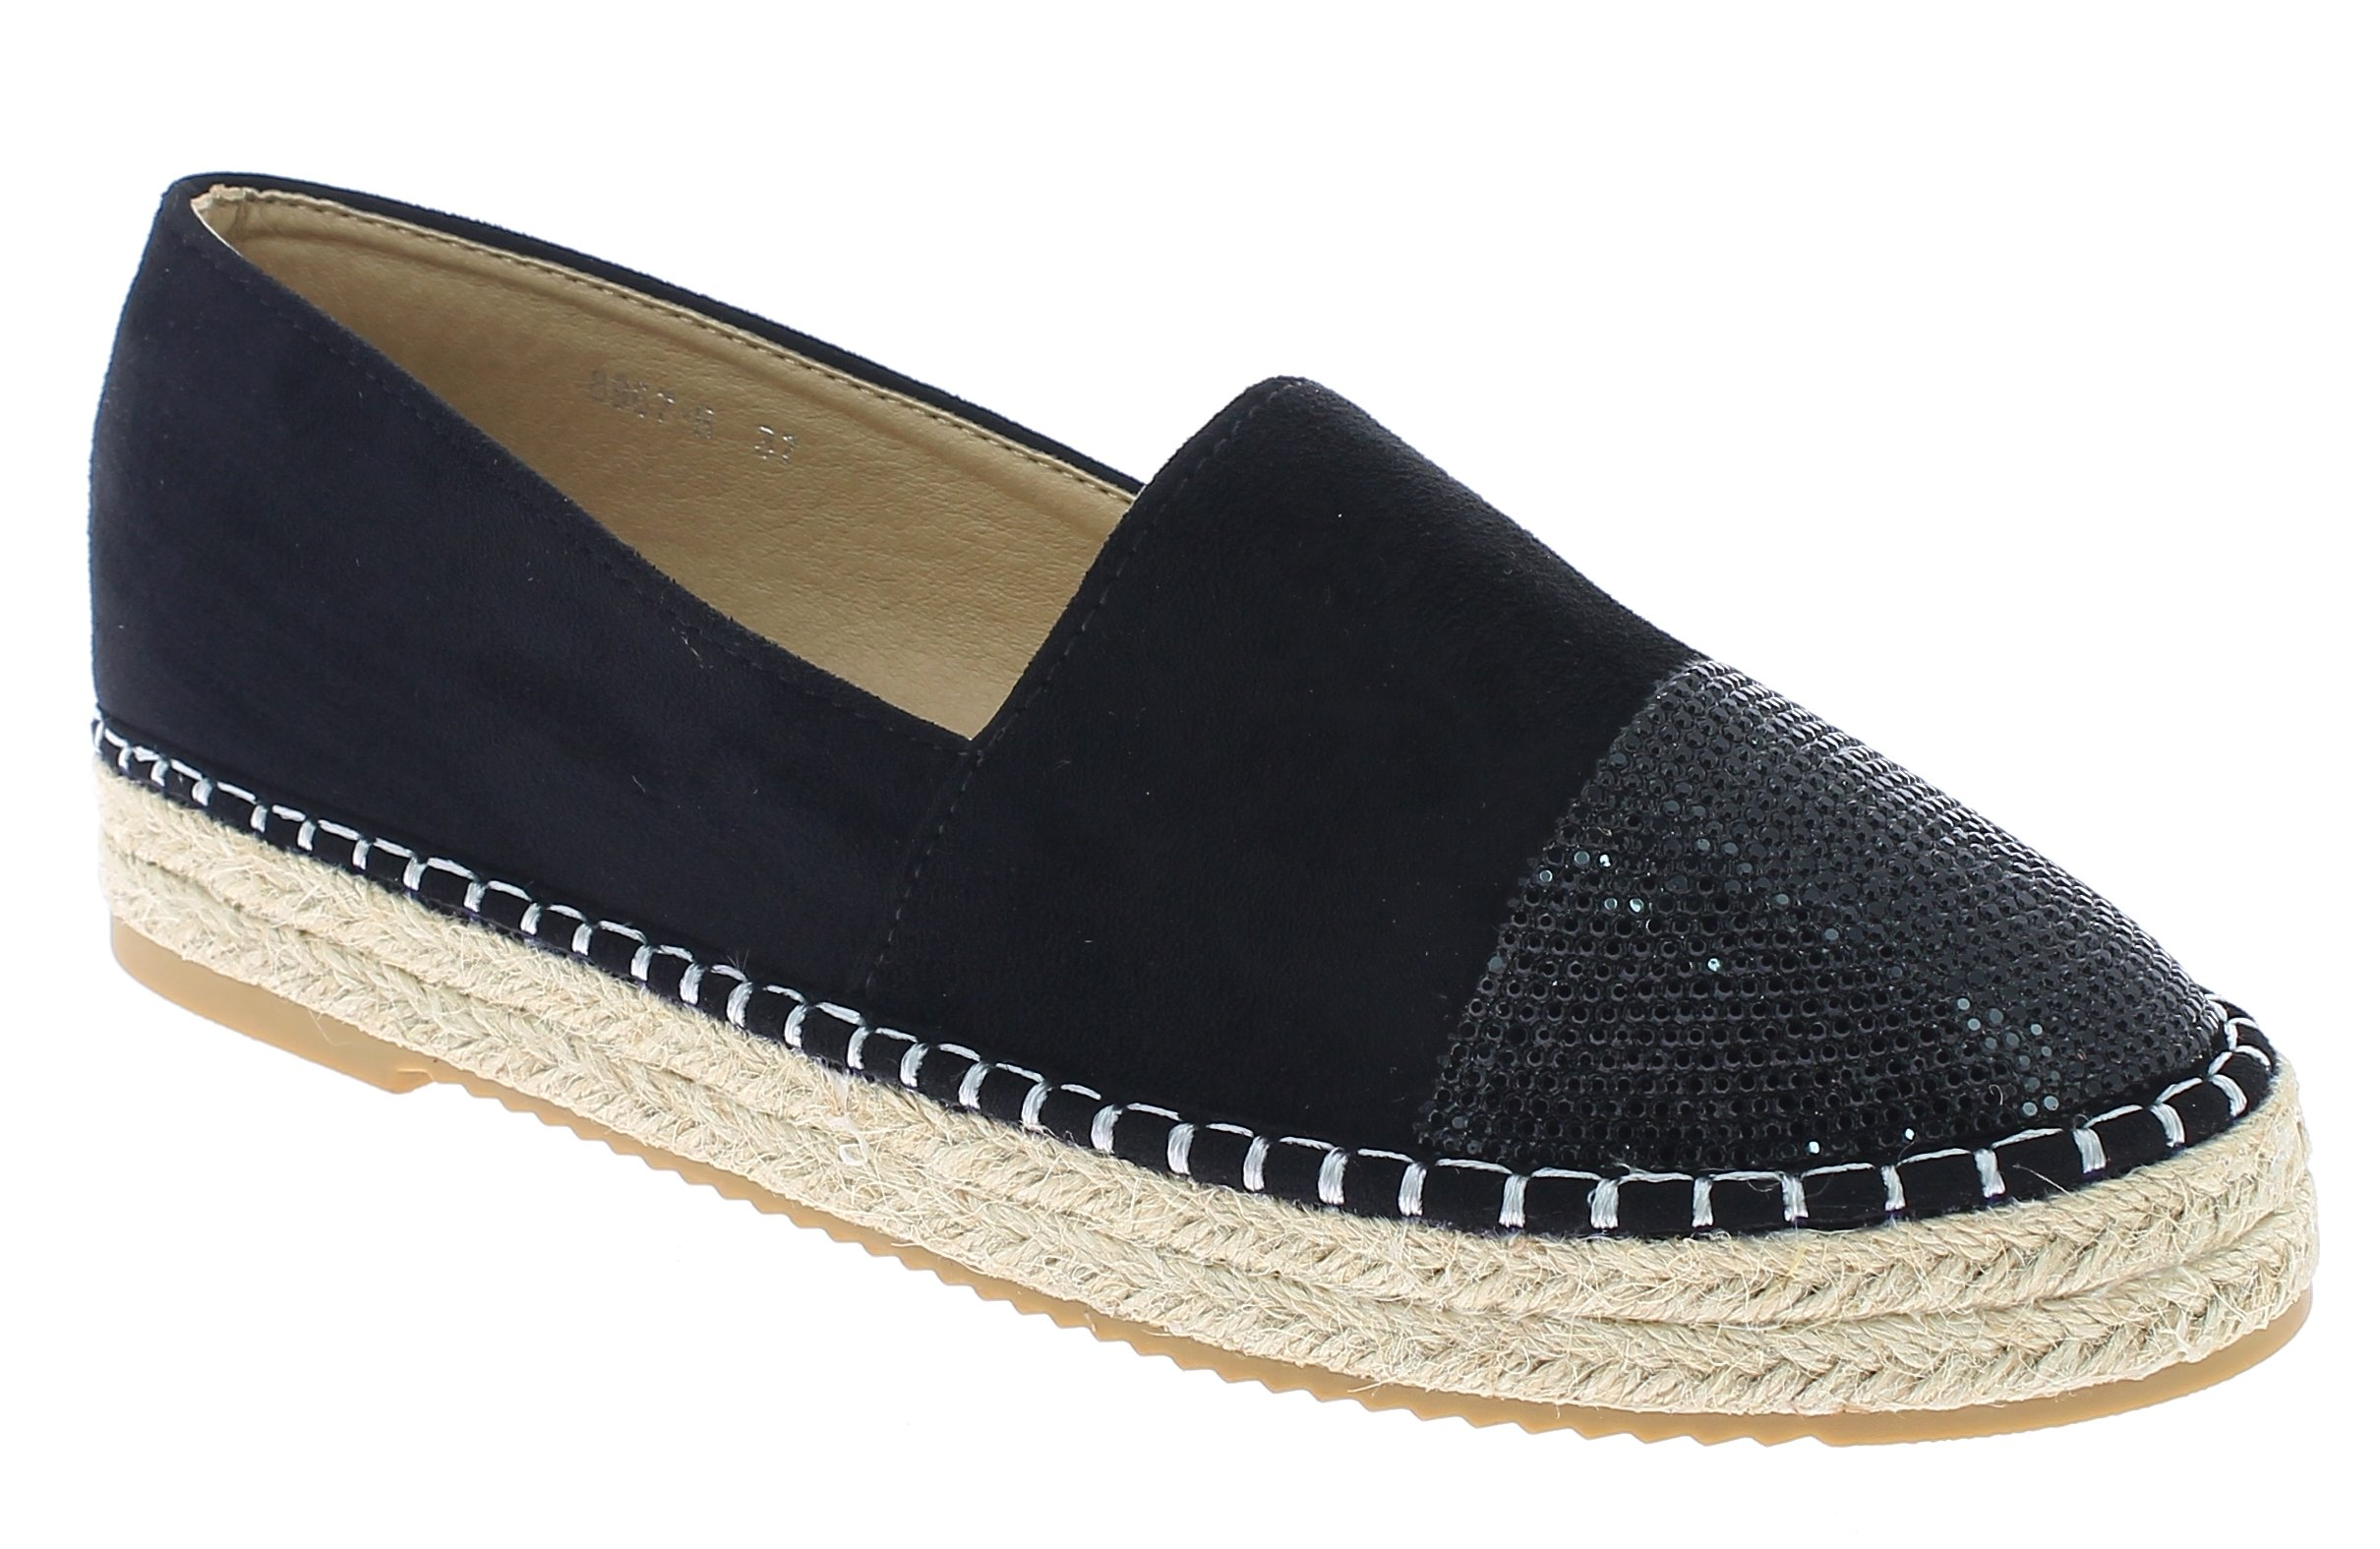 IQSHOES Γυναικείο Casual 8967 Μαύρο - IqShoes - 8967 BLACK-black-38/1/15/11 προϊόντα παπούτσια